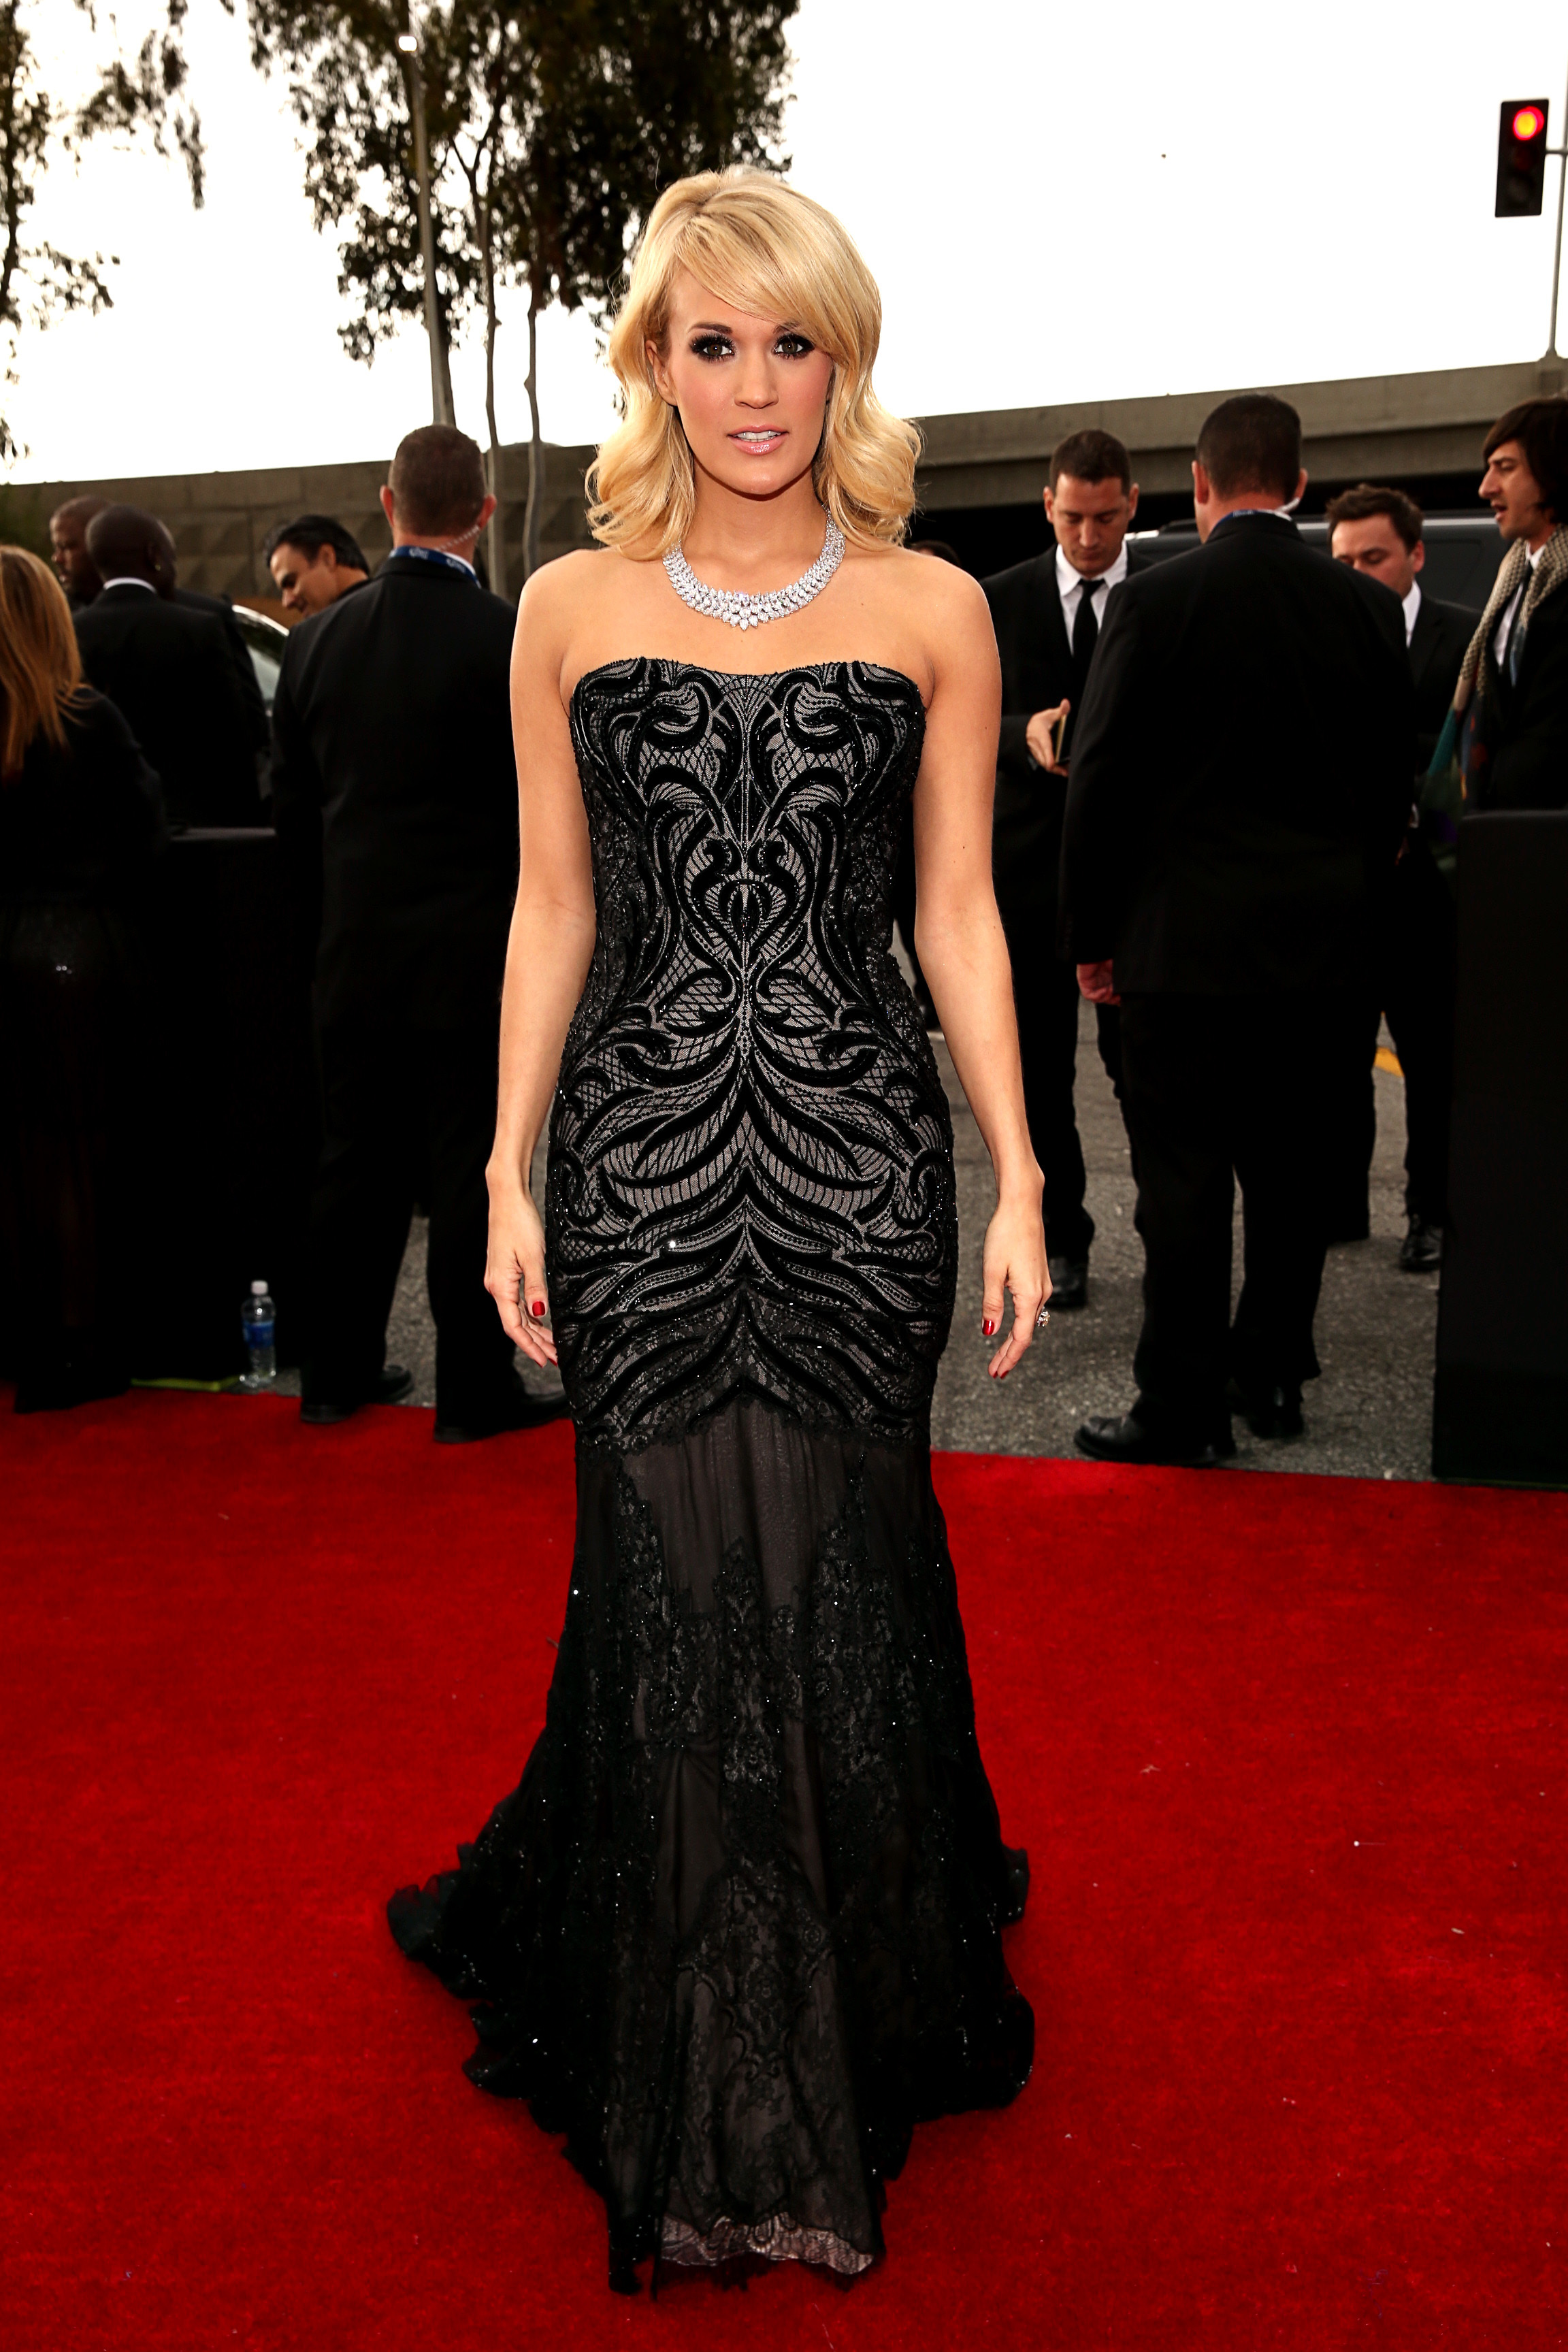 Carrie Underwood black gown 2013 Grammy Awards